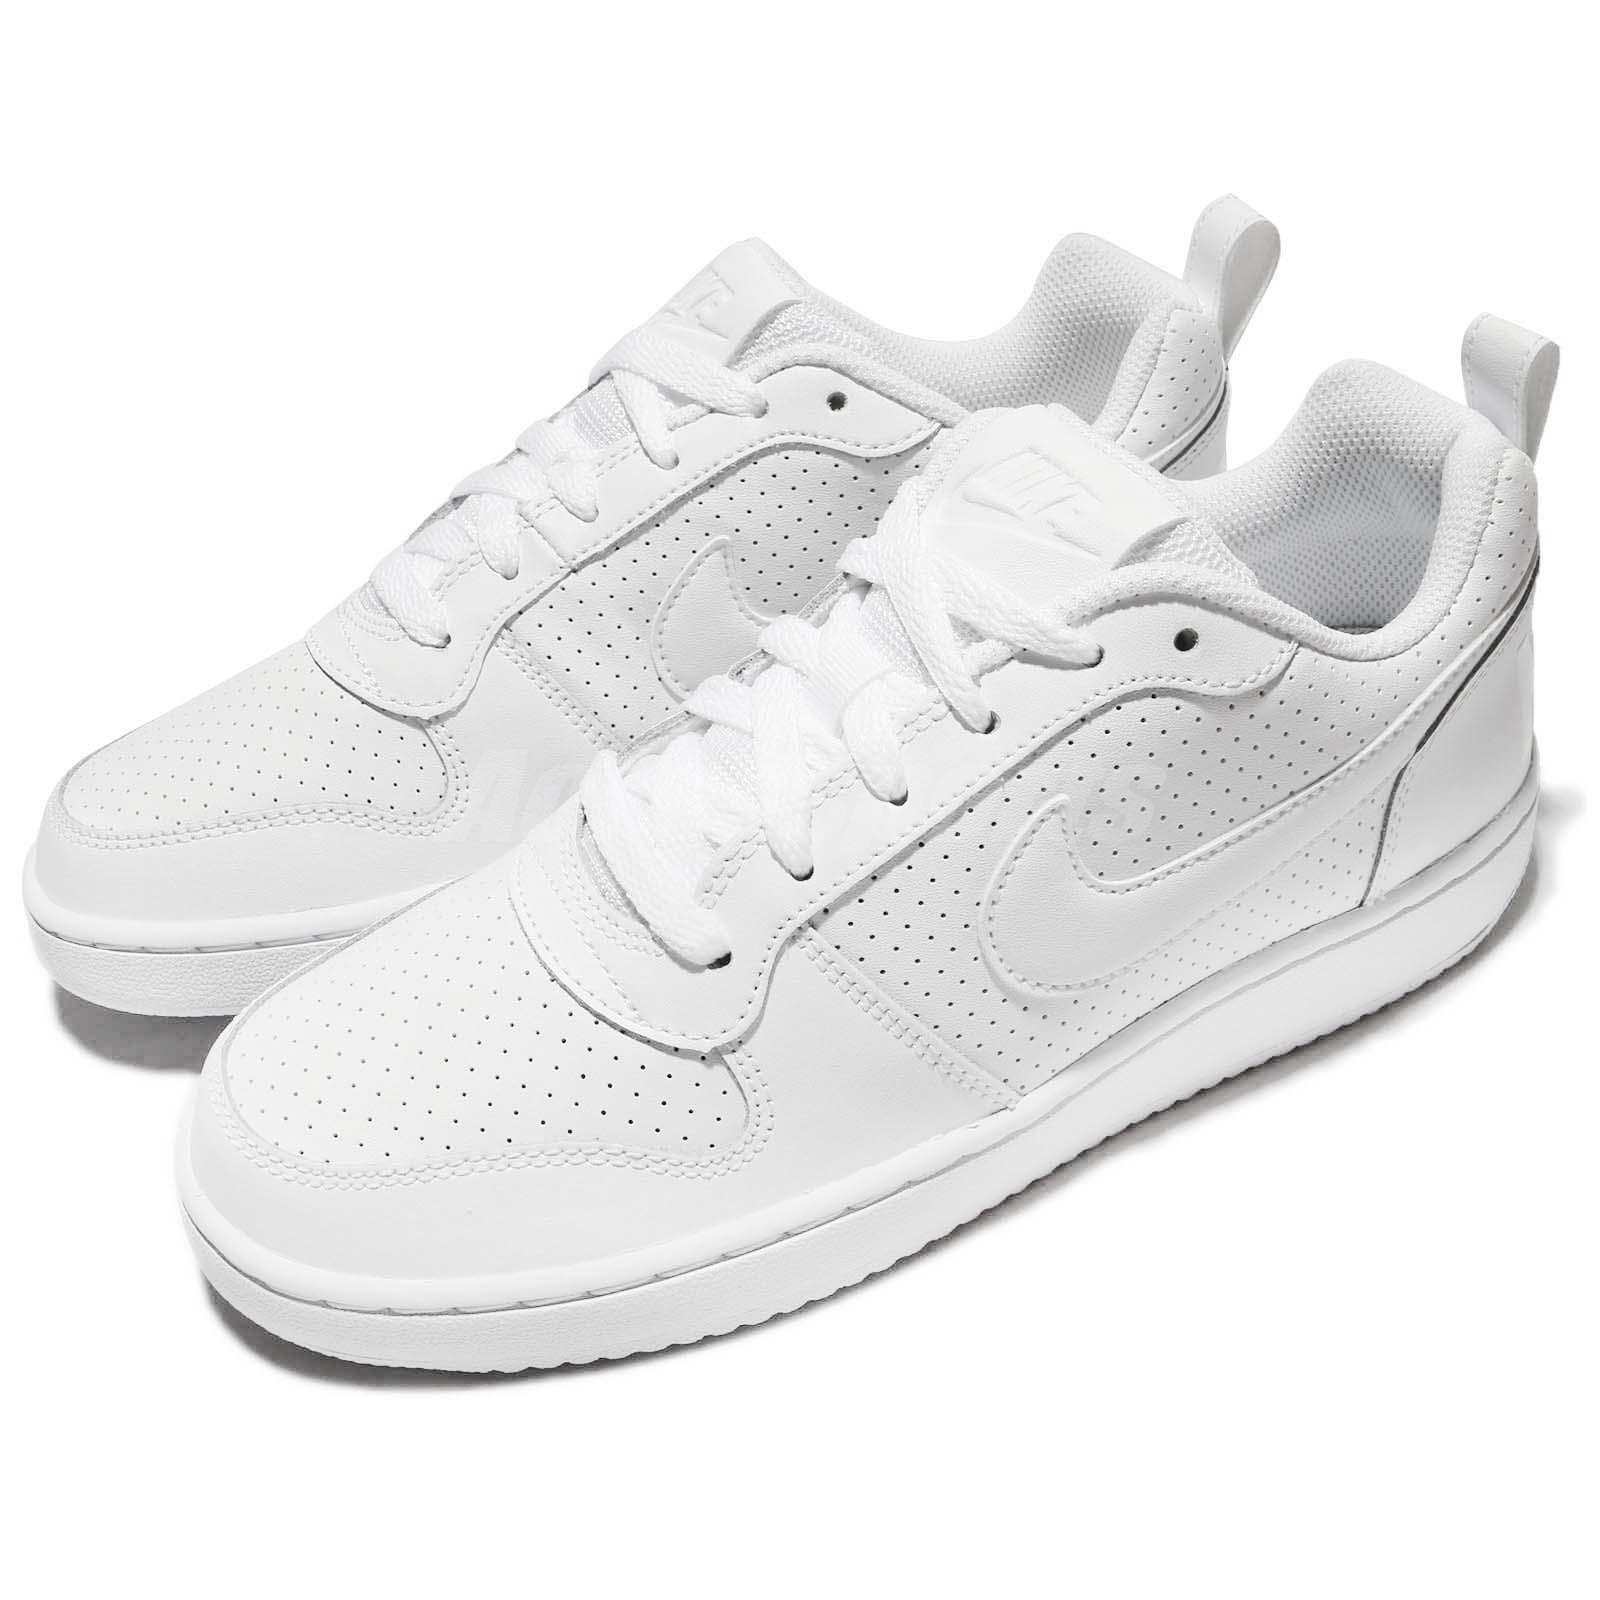 Deportivo Nike Mujer 844905 Blanco